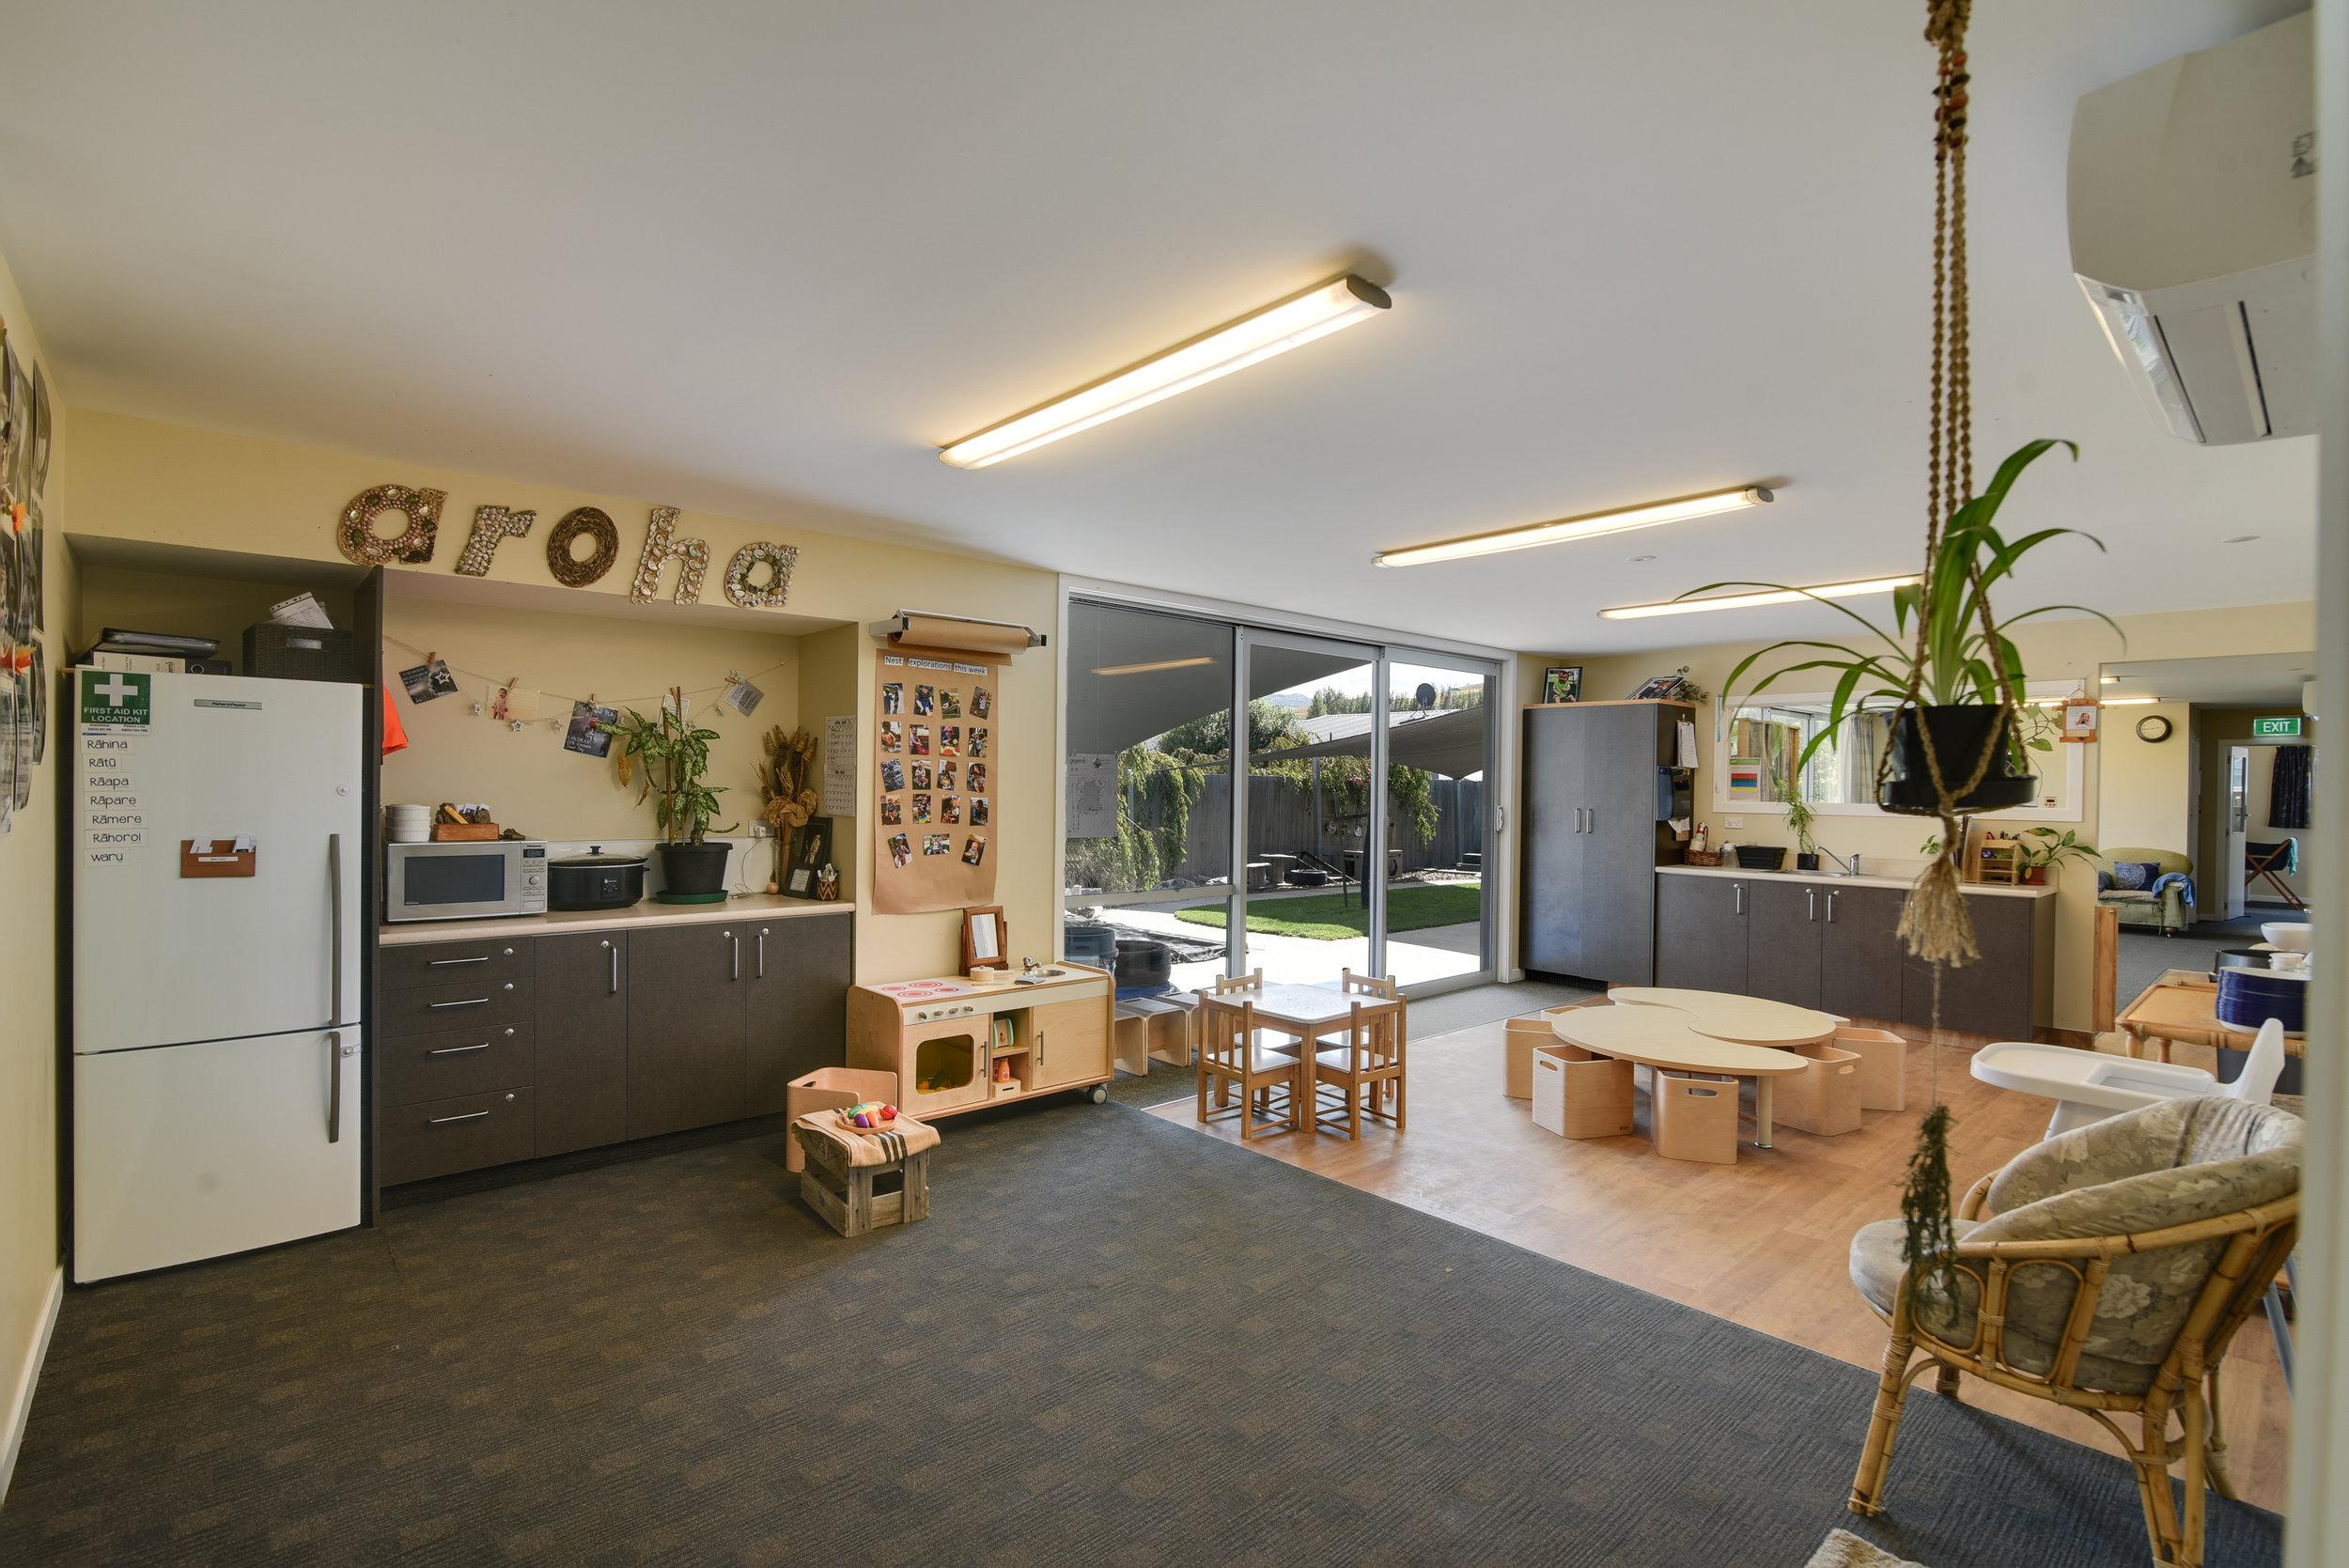 Gems Childcare interiors-8.jpg